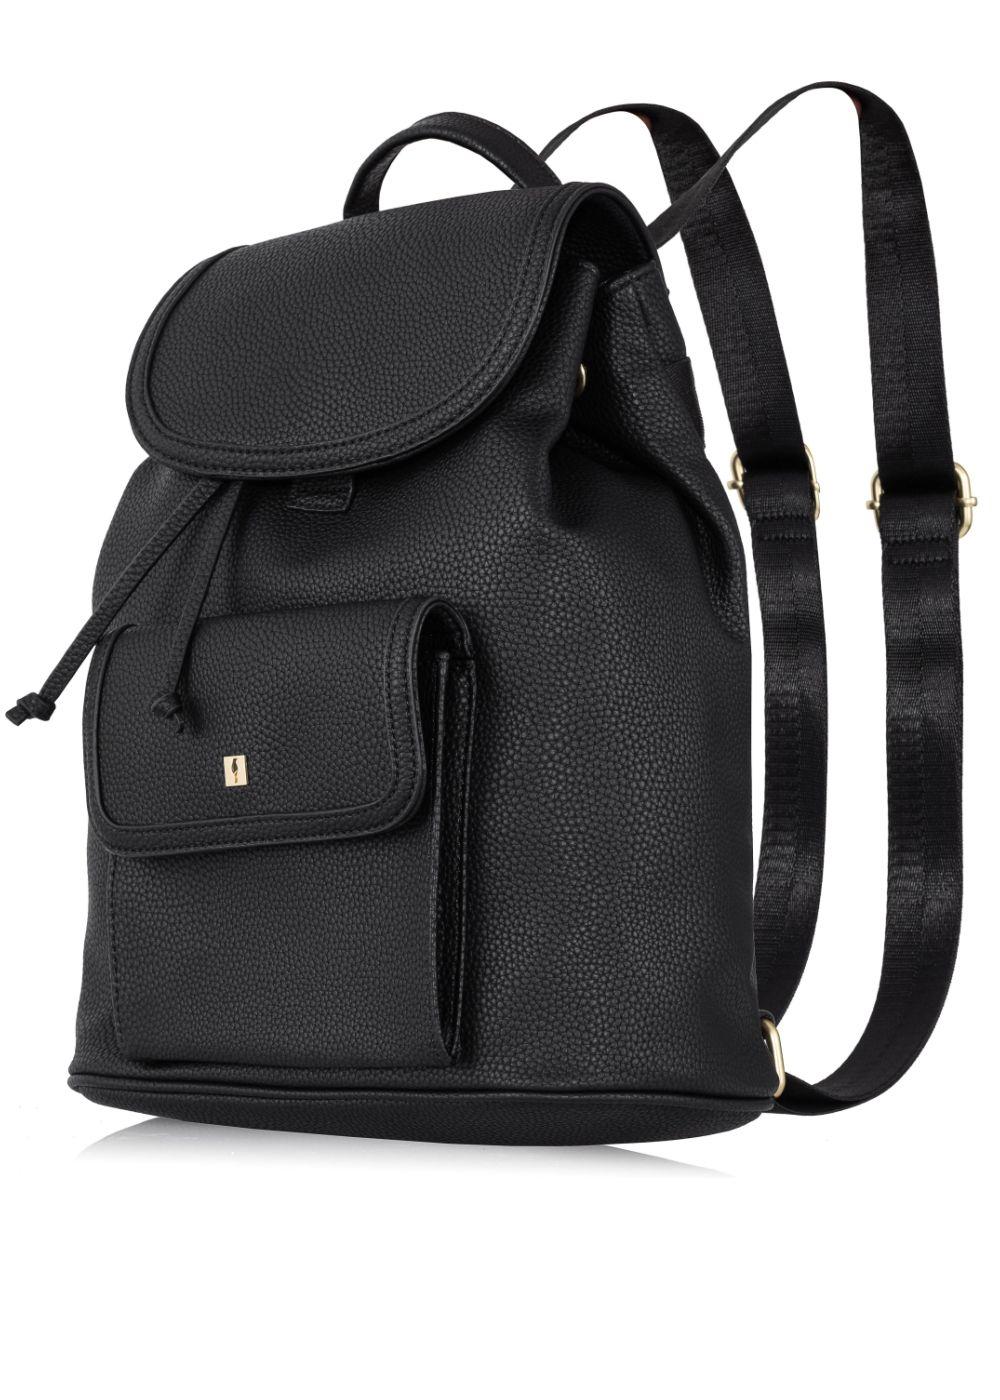 Plecak damski TOREC-0435-99(W21)